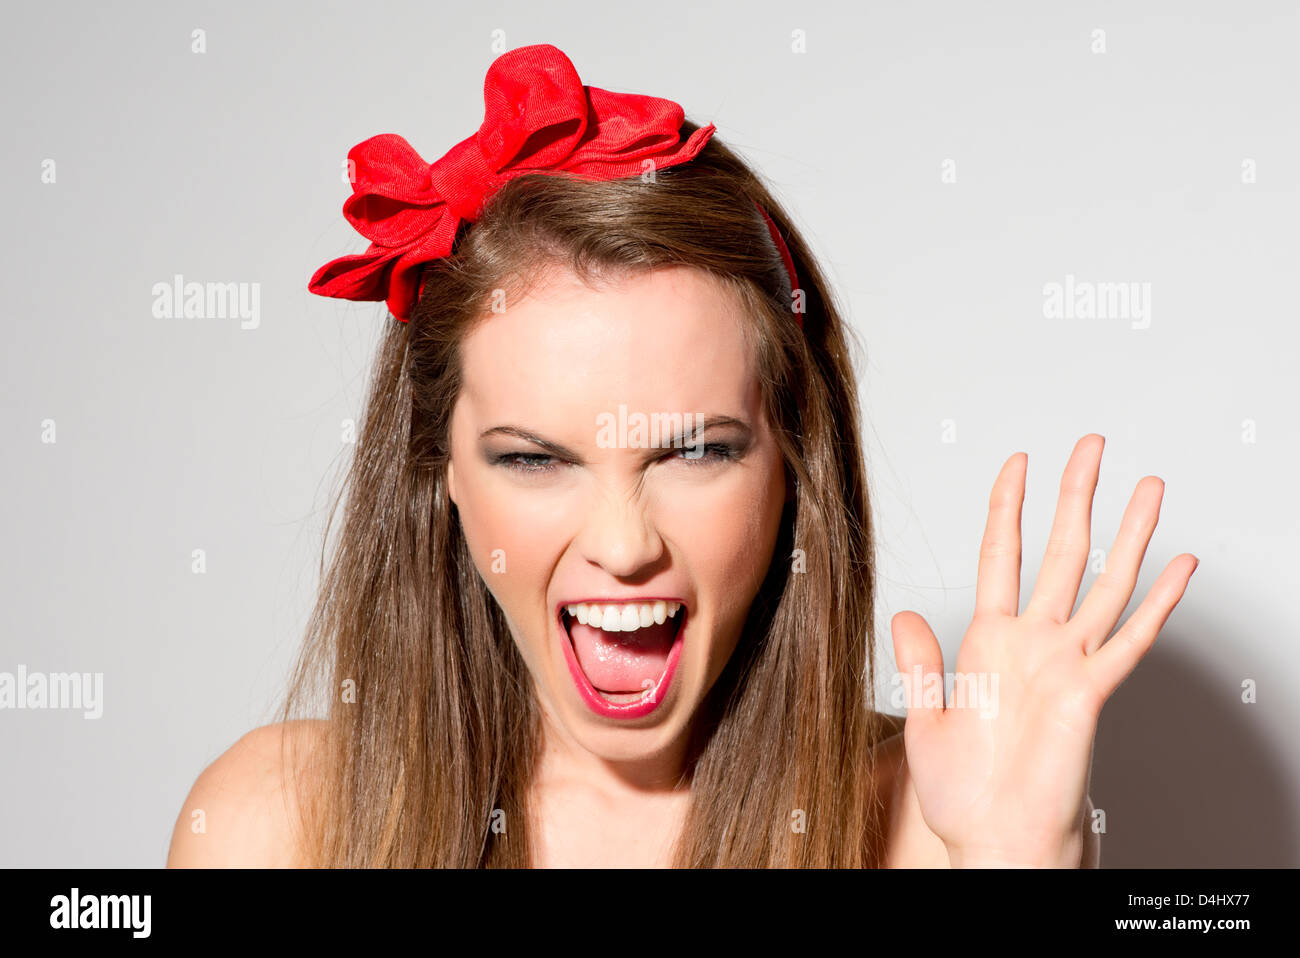 woman shouting - Stock Image